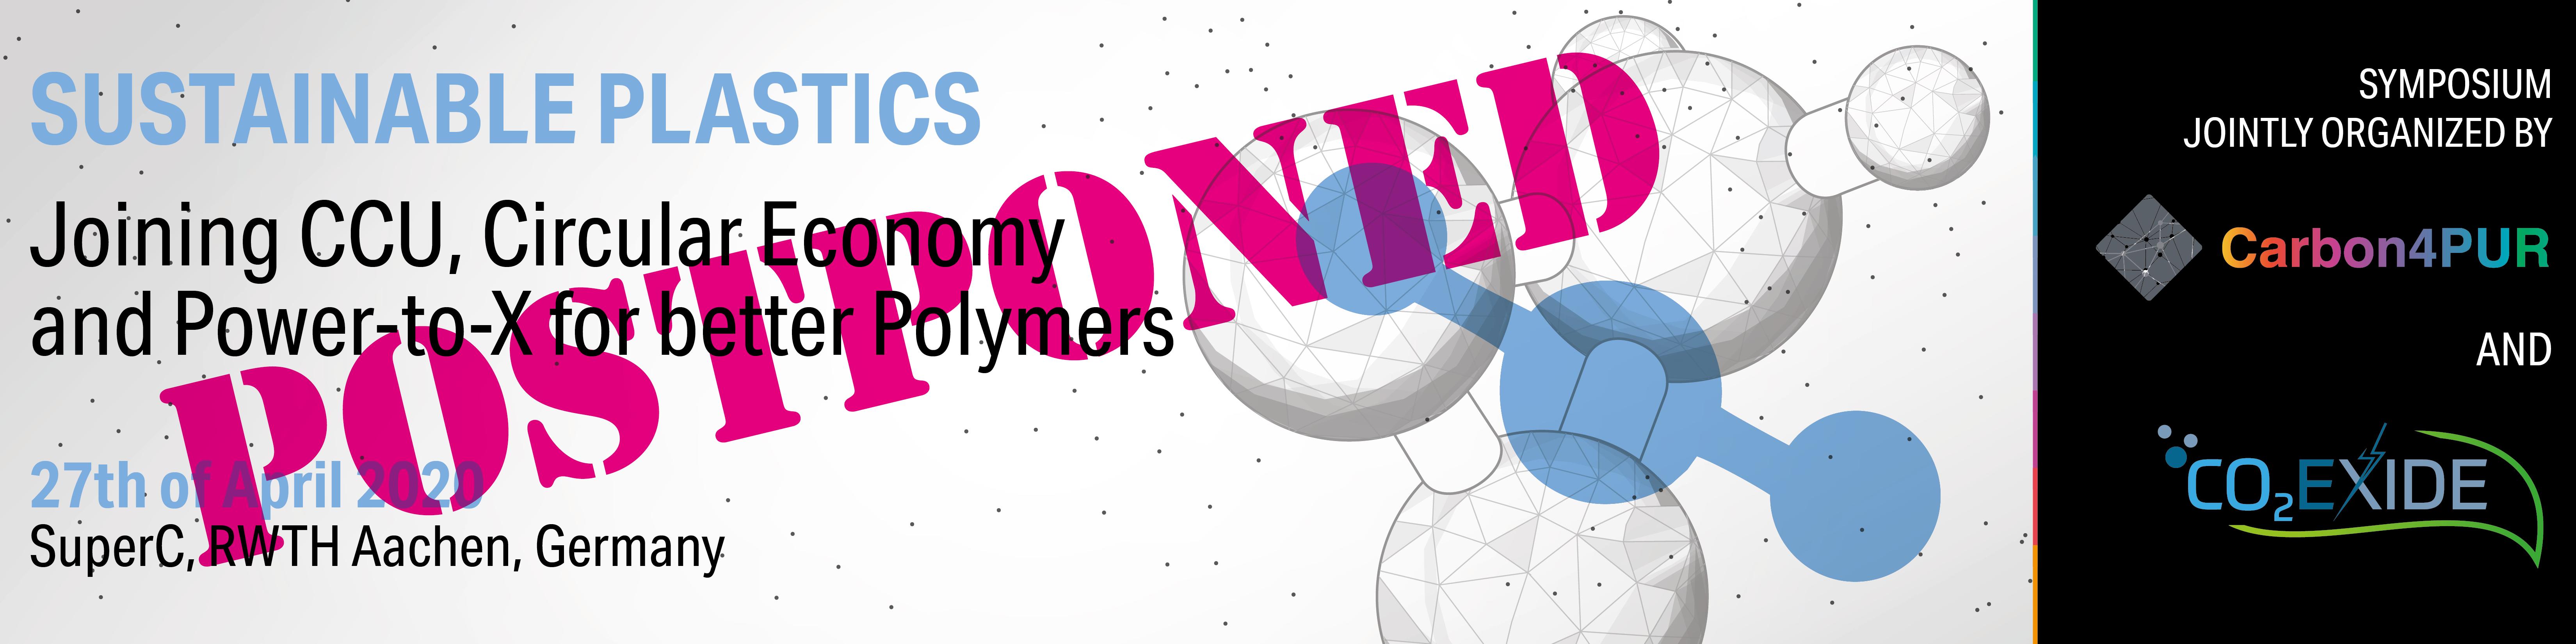 Sustainable Plastics Symposium Postponed to September 2020 in Brussels